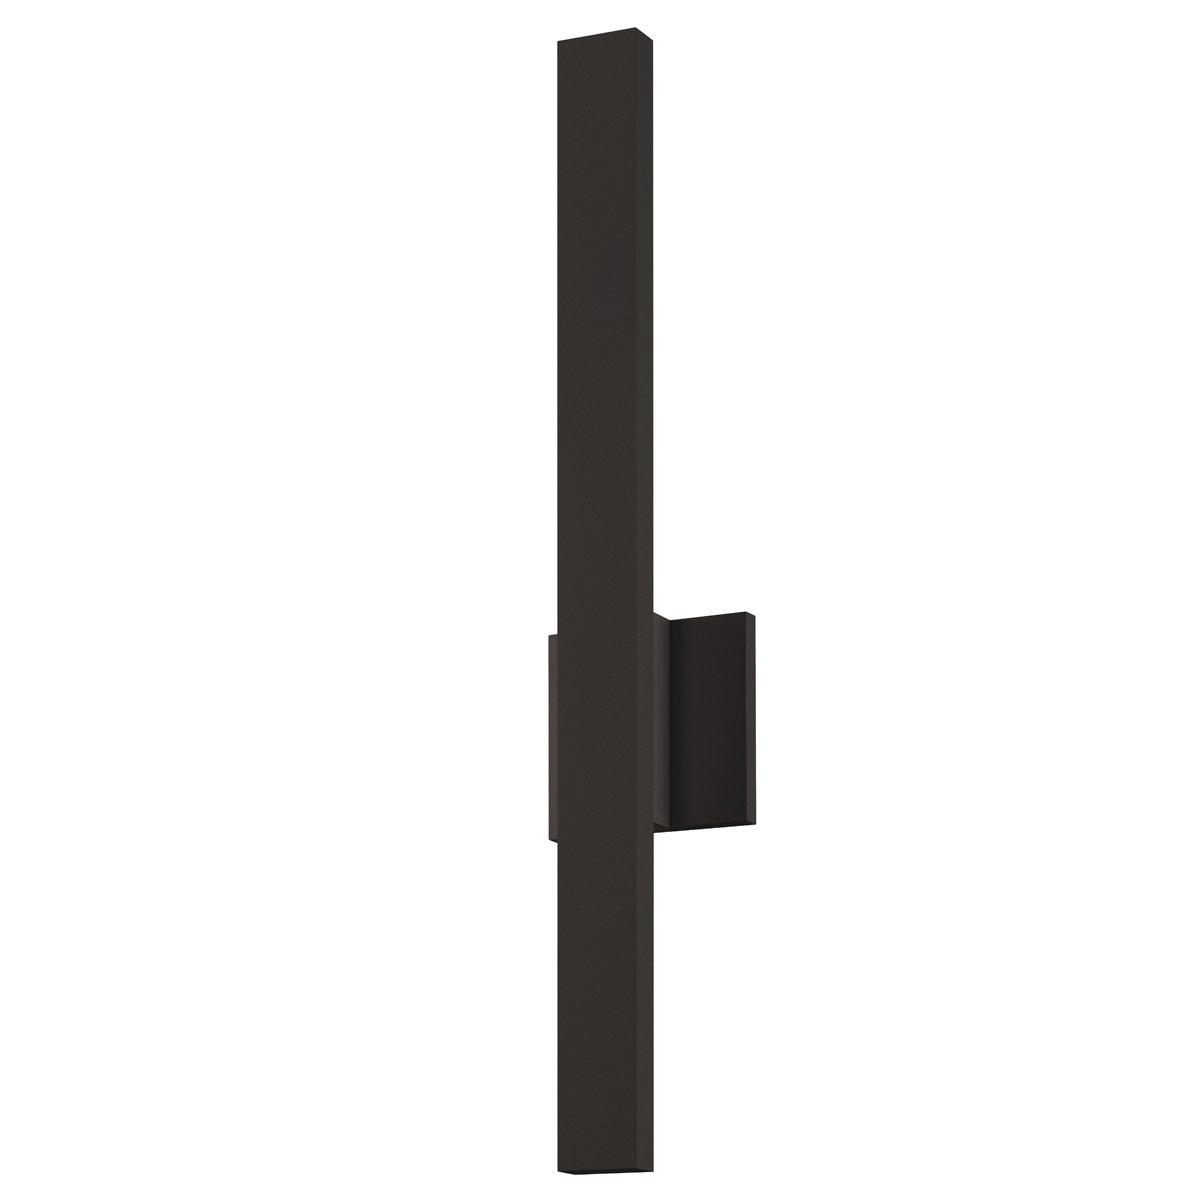 sonneman Sword LED Sconce outdoor